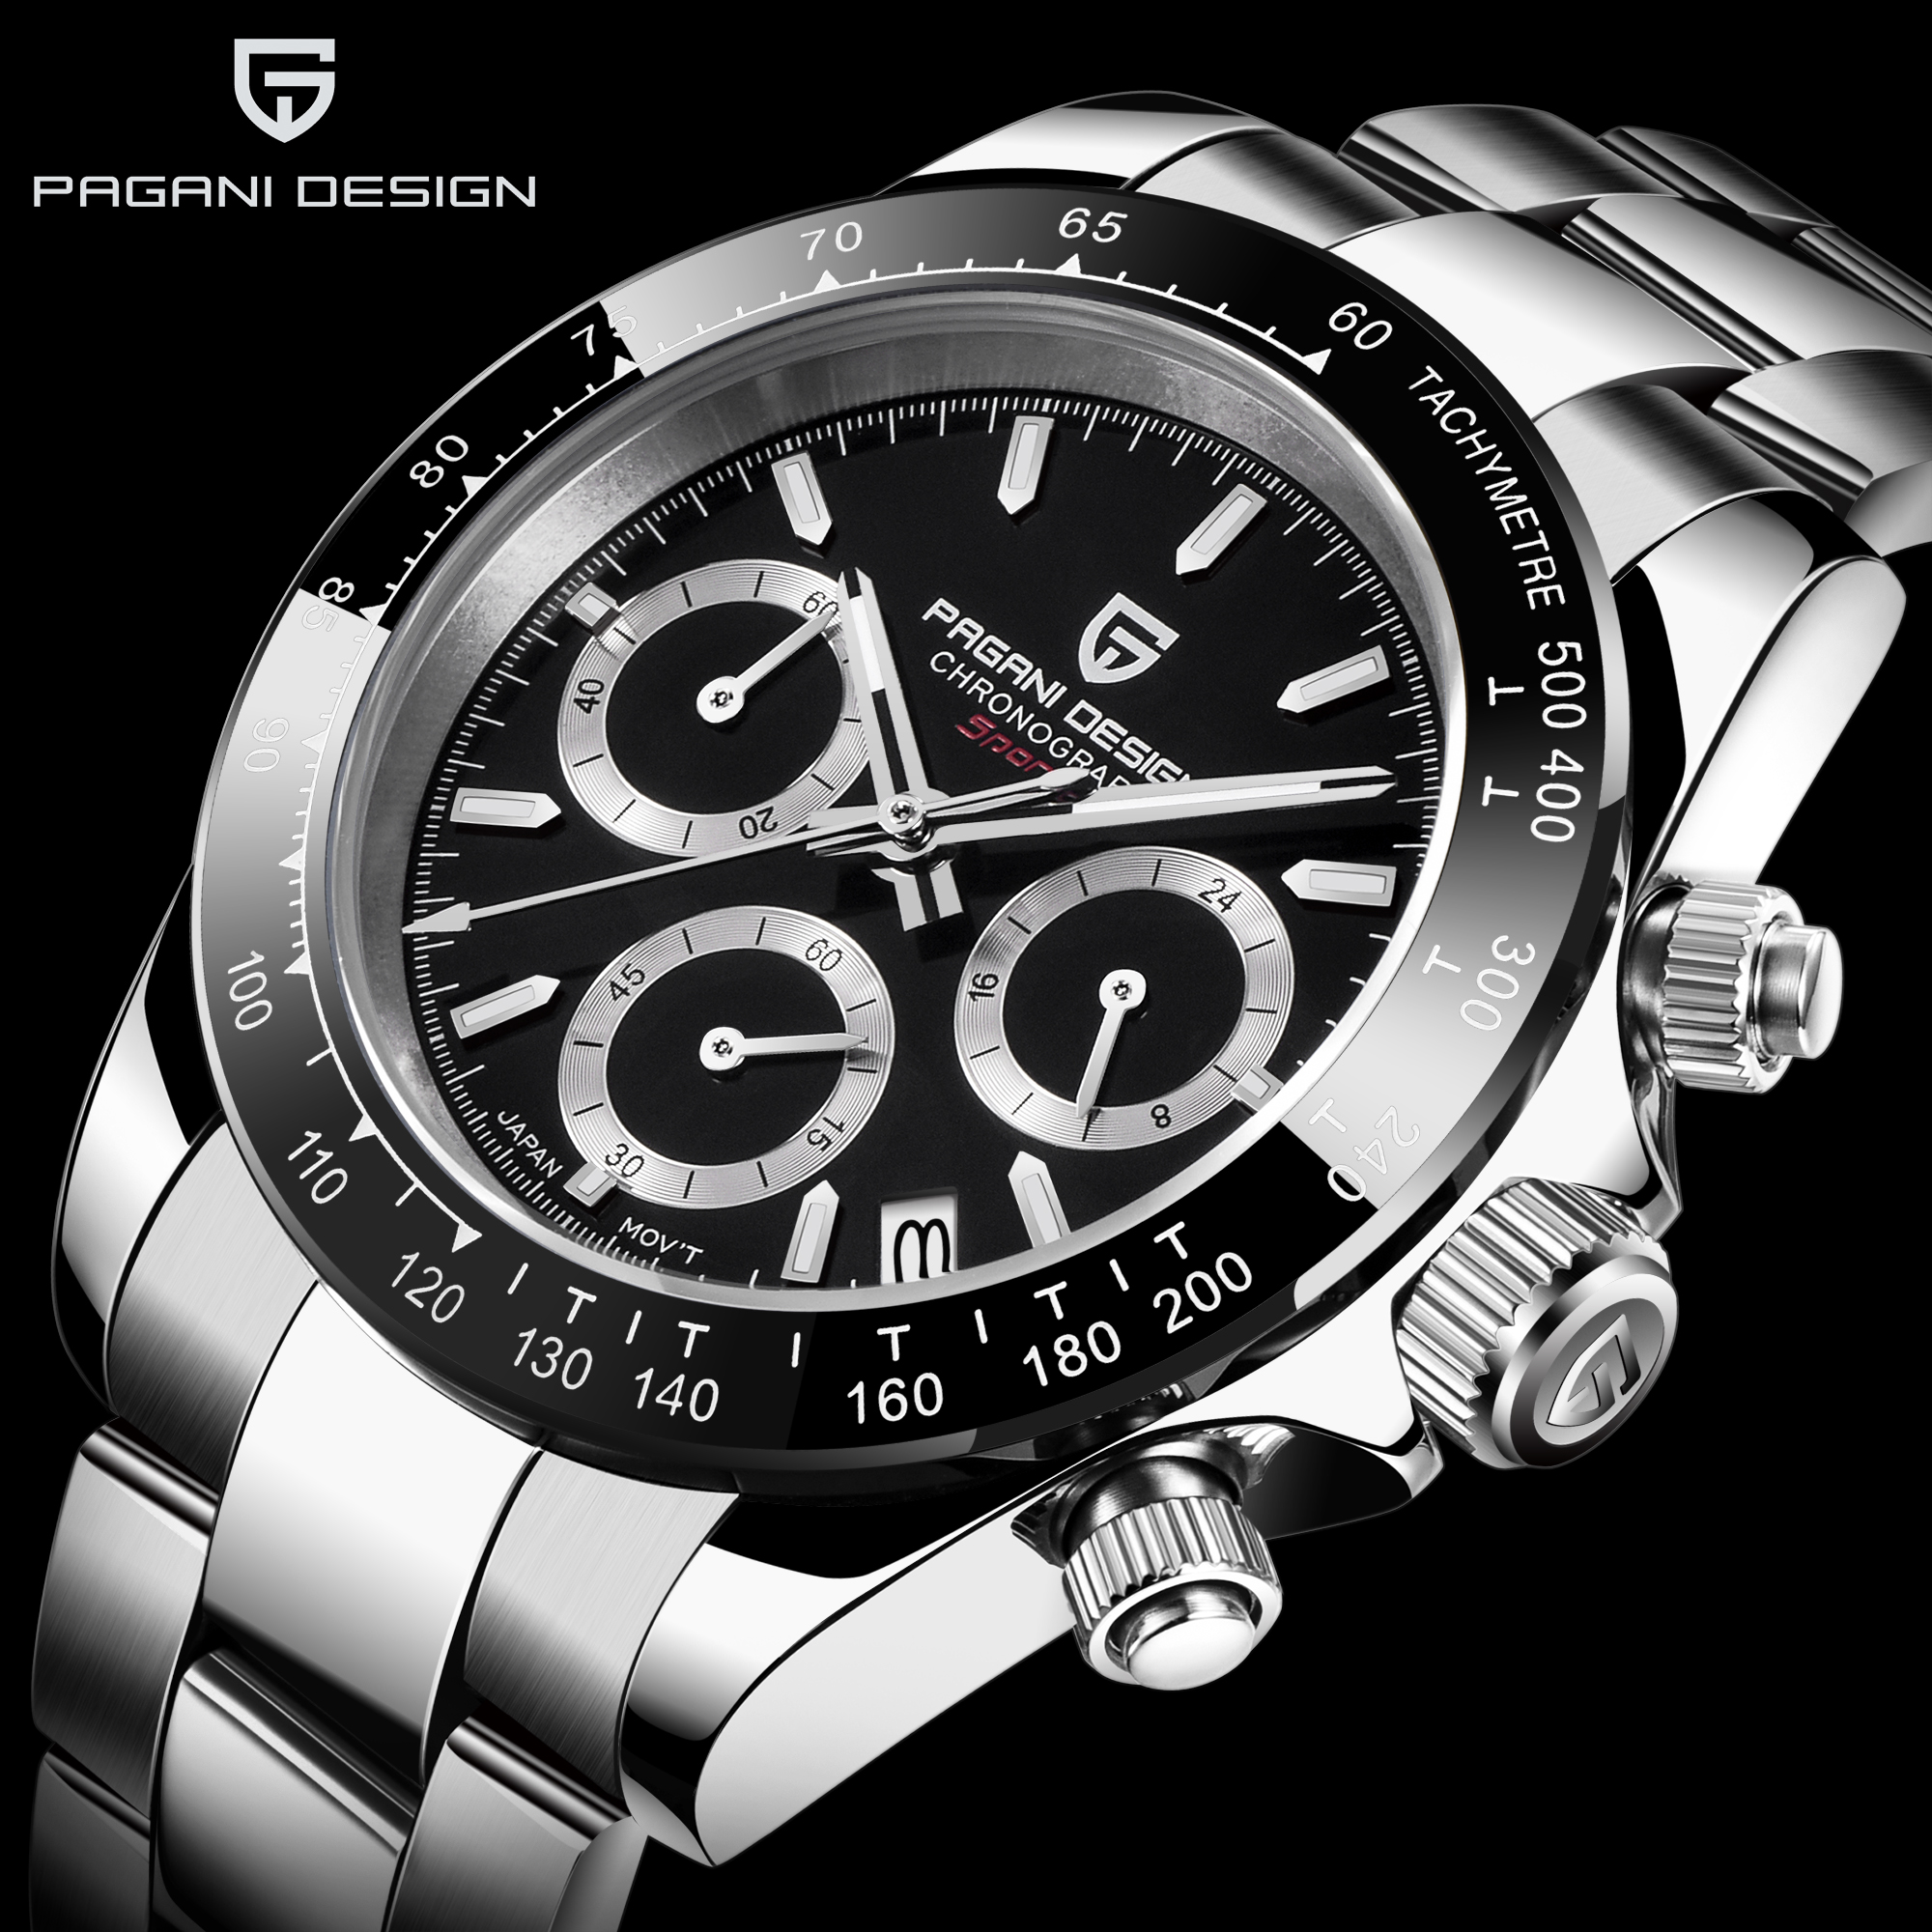 PAGANI Mens Relógios Top Marca de Luxo relógio de Pulso Relógio de Quartzo preto Homens Relógio À Prova D' Água Esporte Cronógrafo Relogio masculino